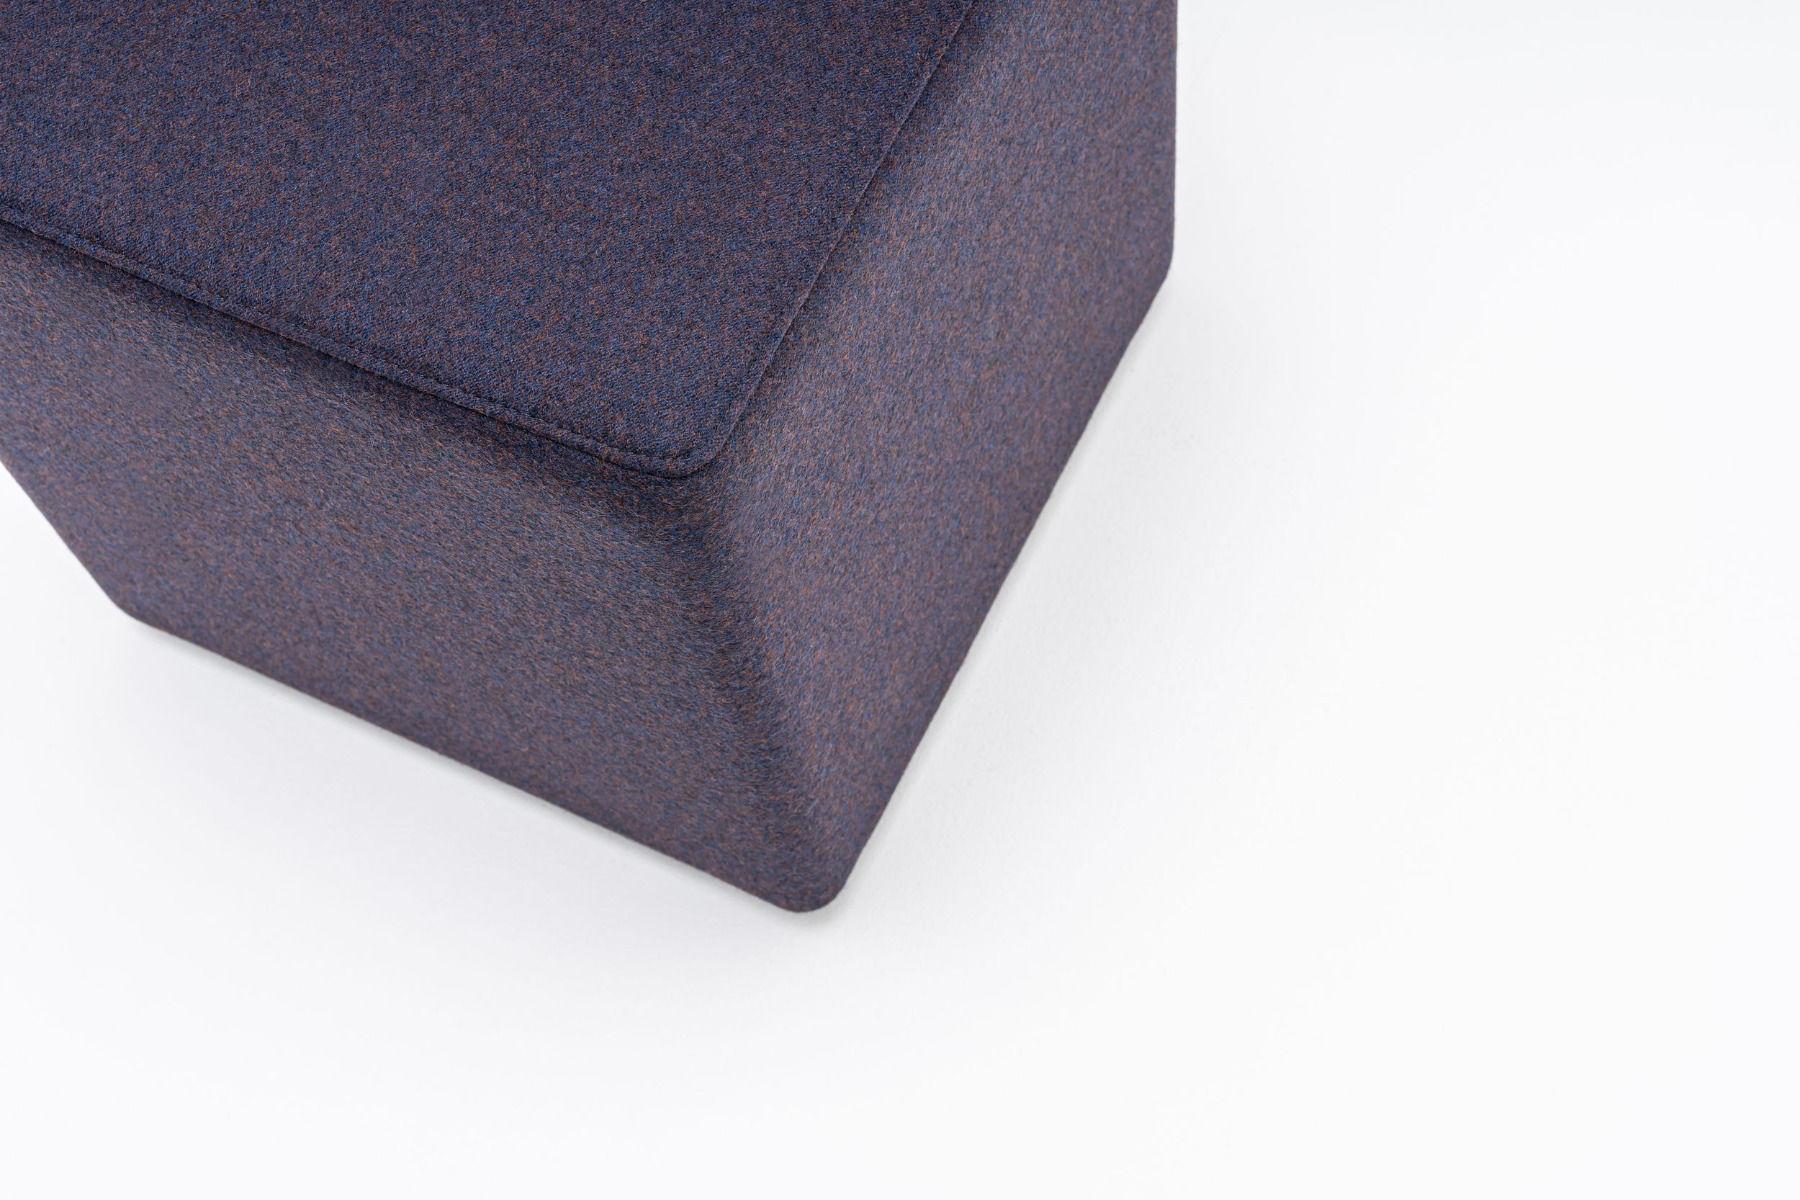 empfangstheken sitzmoebel lounge museum lila details